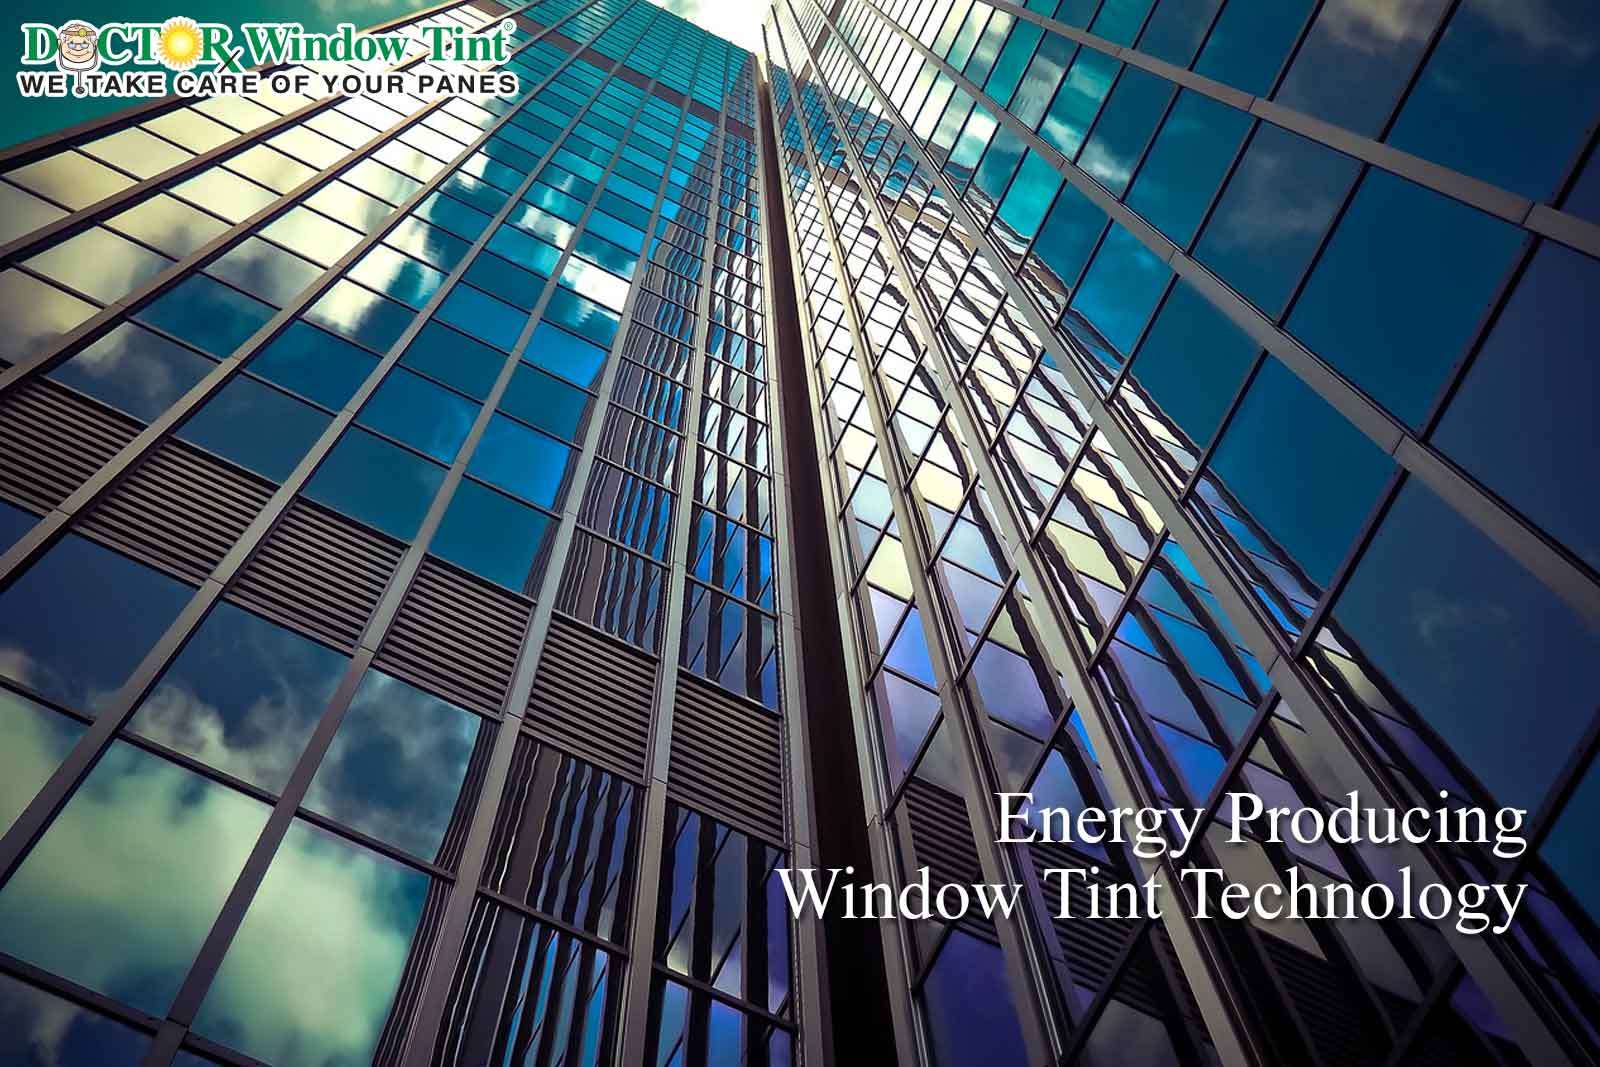 Window Tint Technology